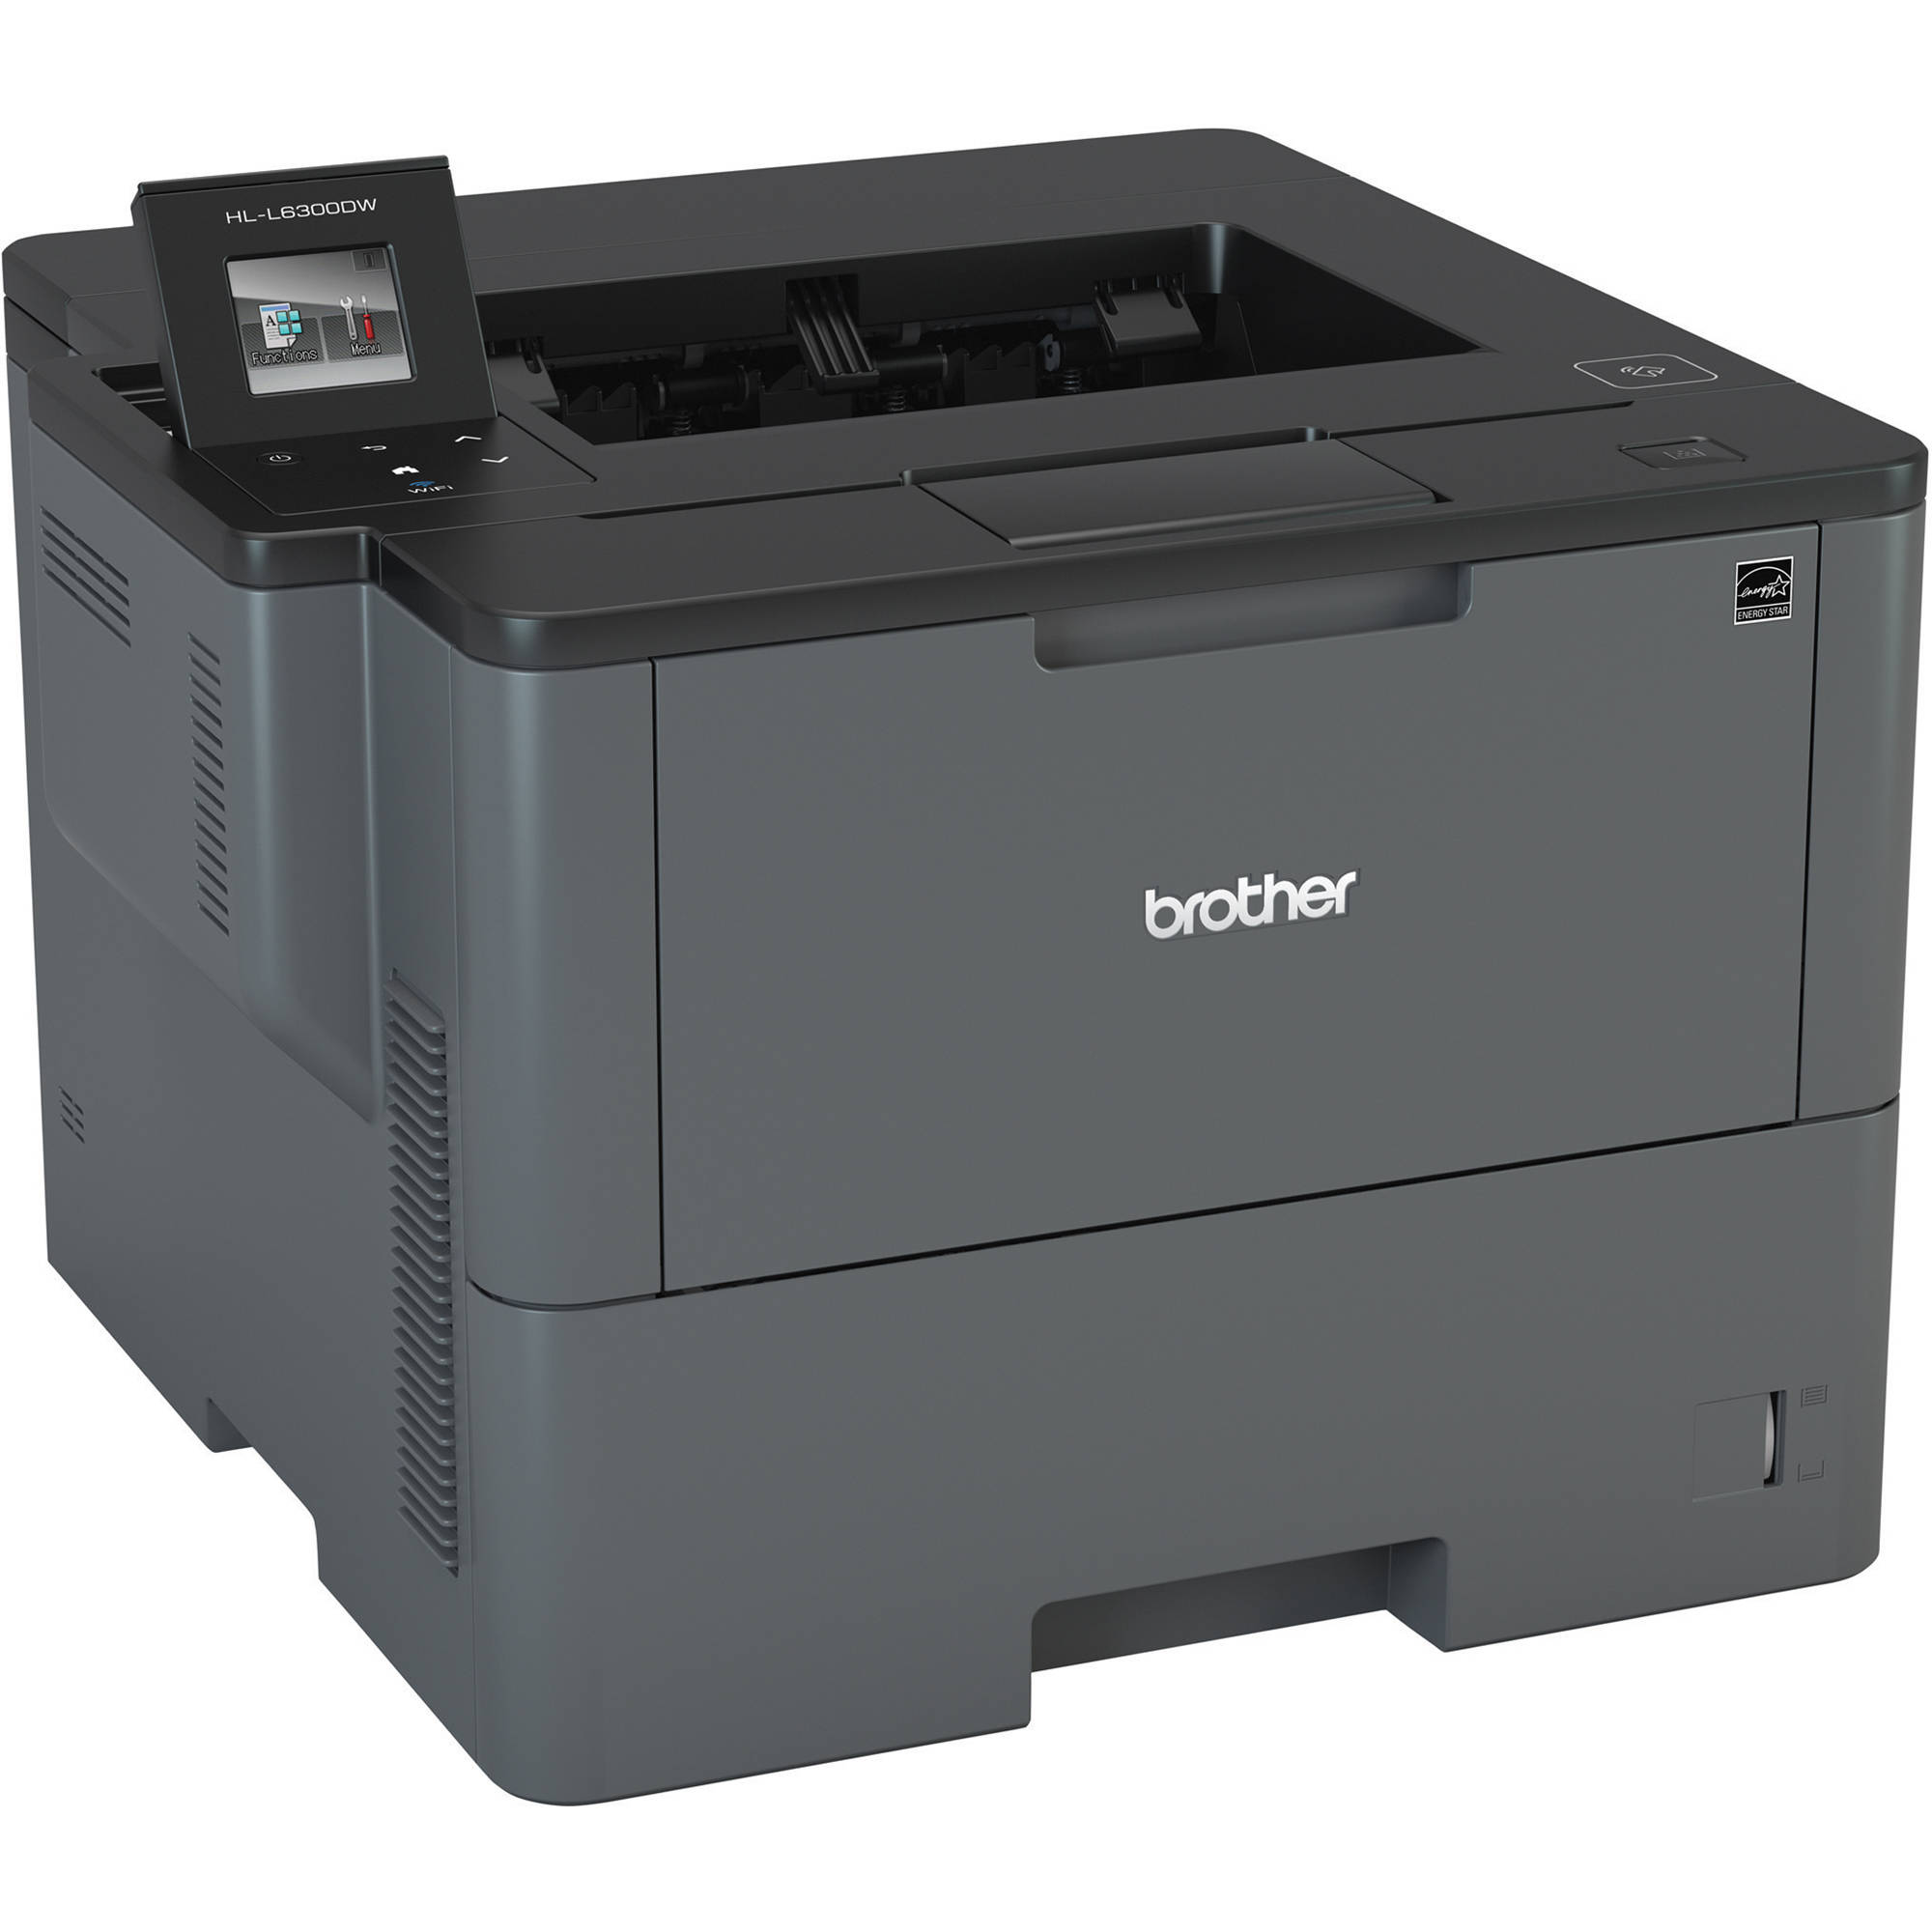 Принтер Brother HL-L6300DW